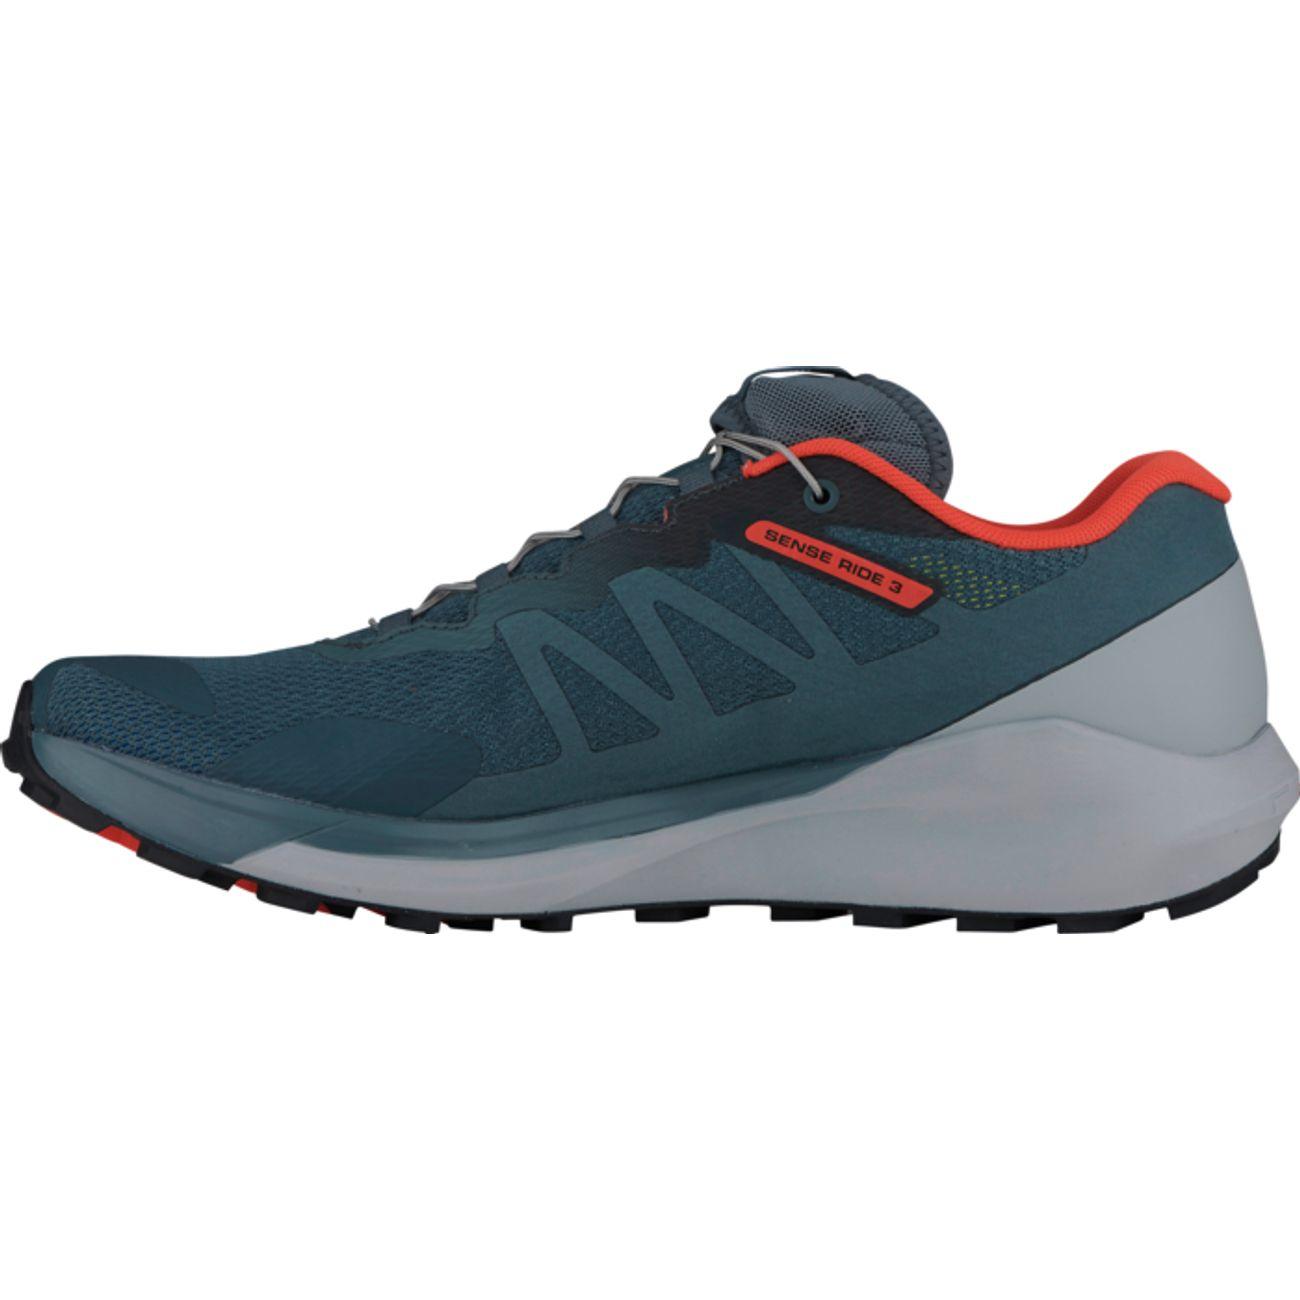 Chaussures Trail Trail homme SALOMON SENSE RIDE 3